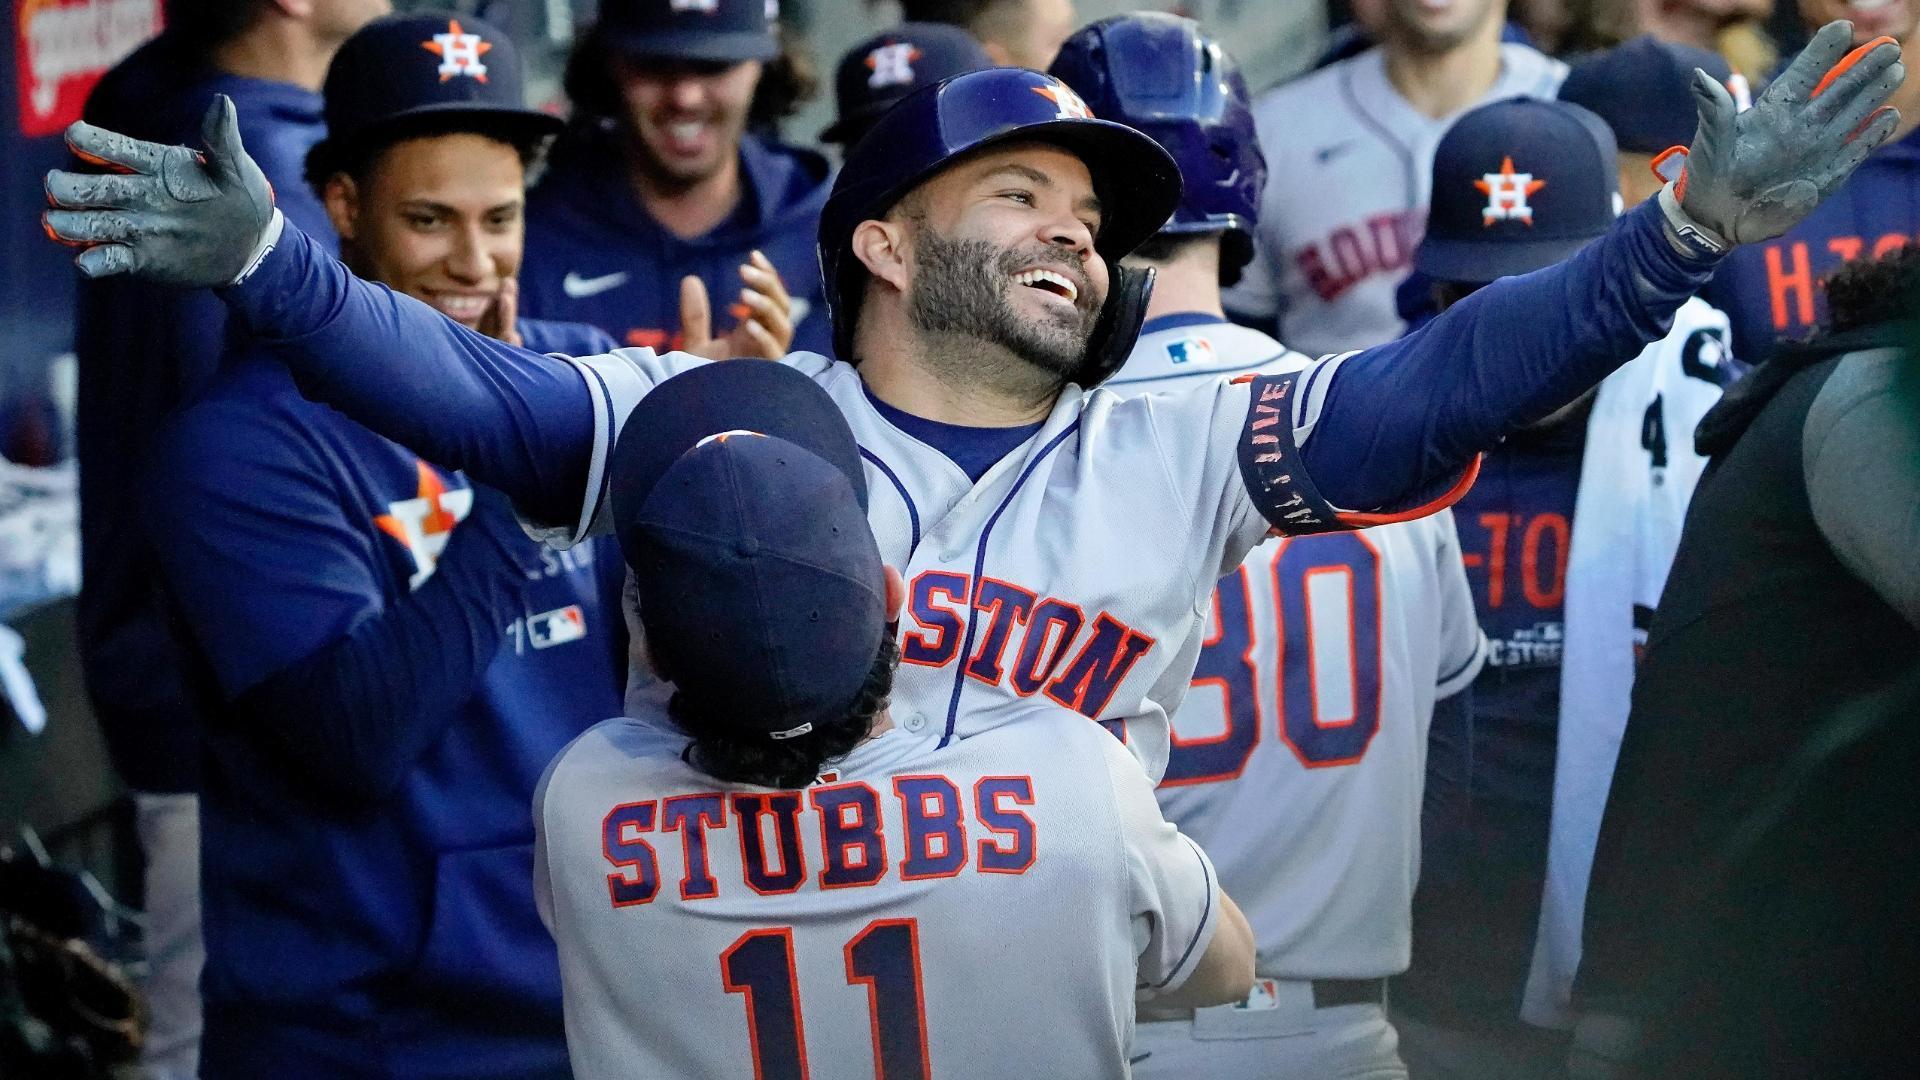 Jose Altuve blasts 3-run homer in Astros' win